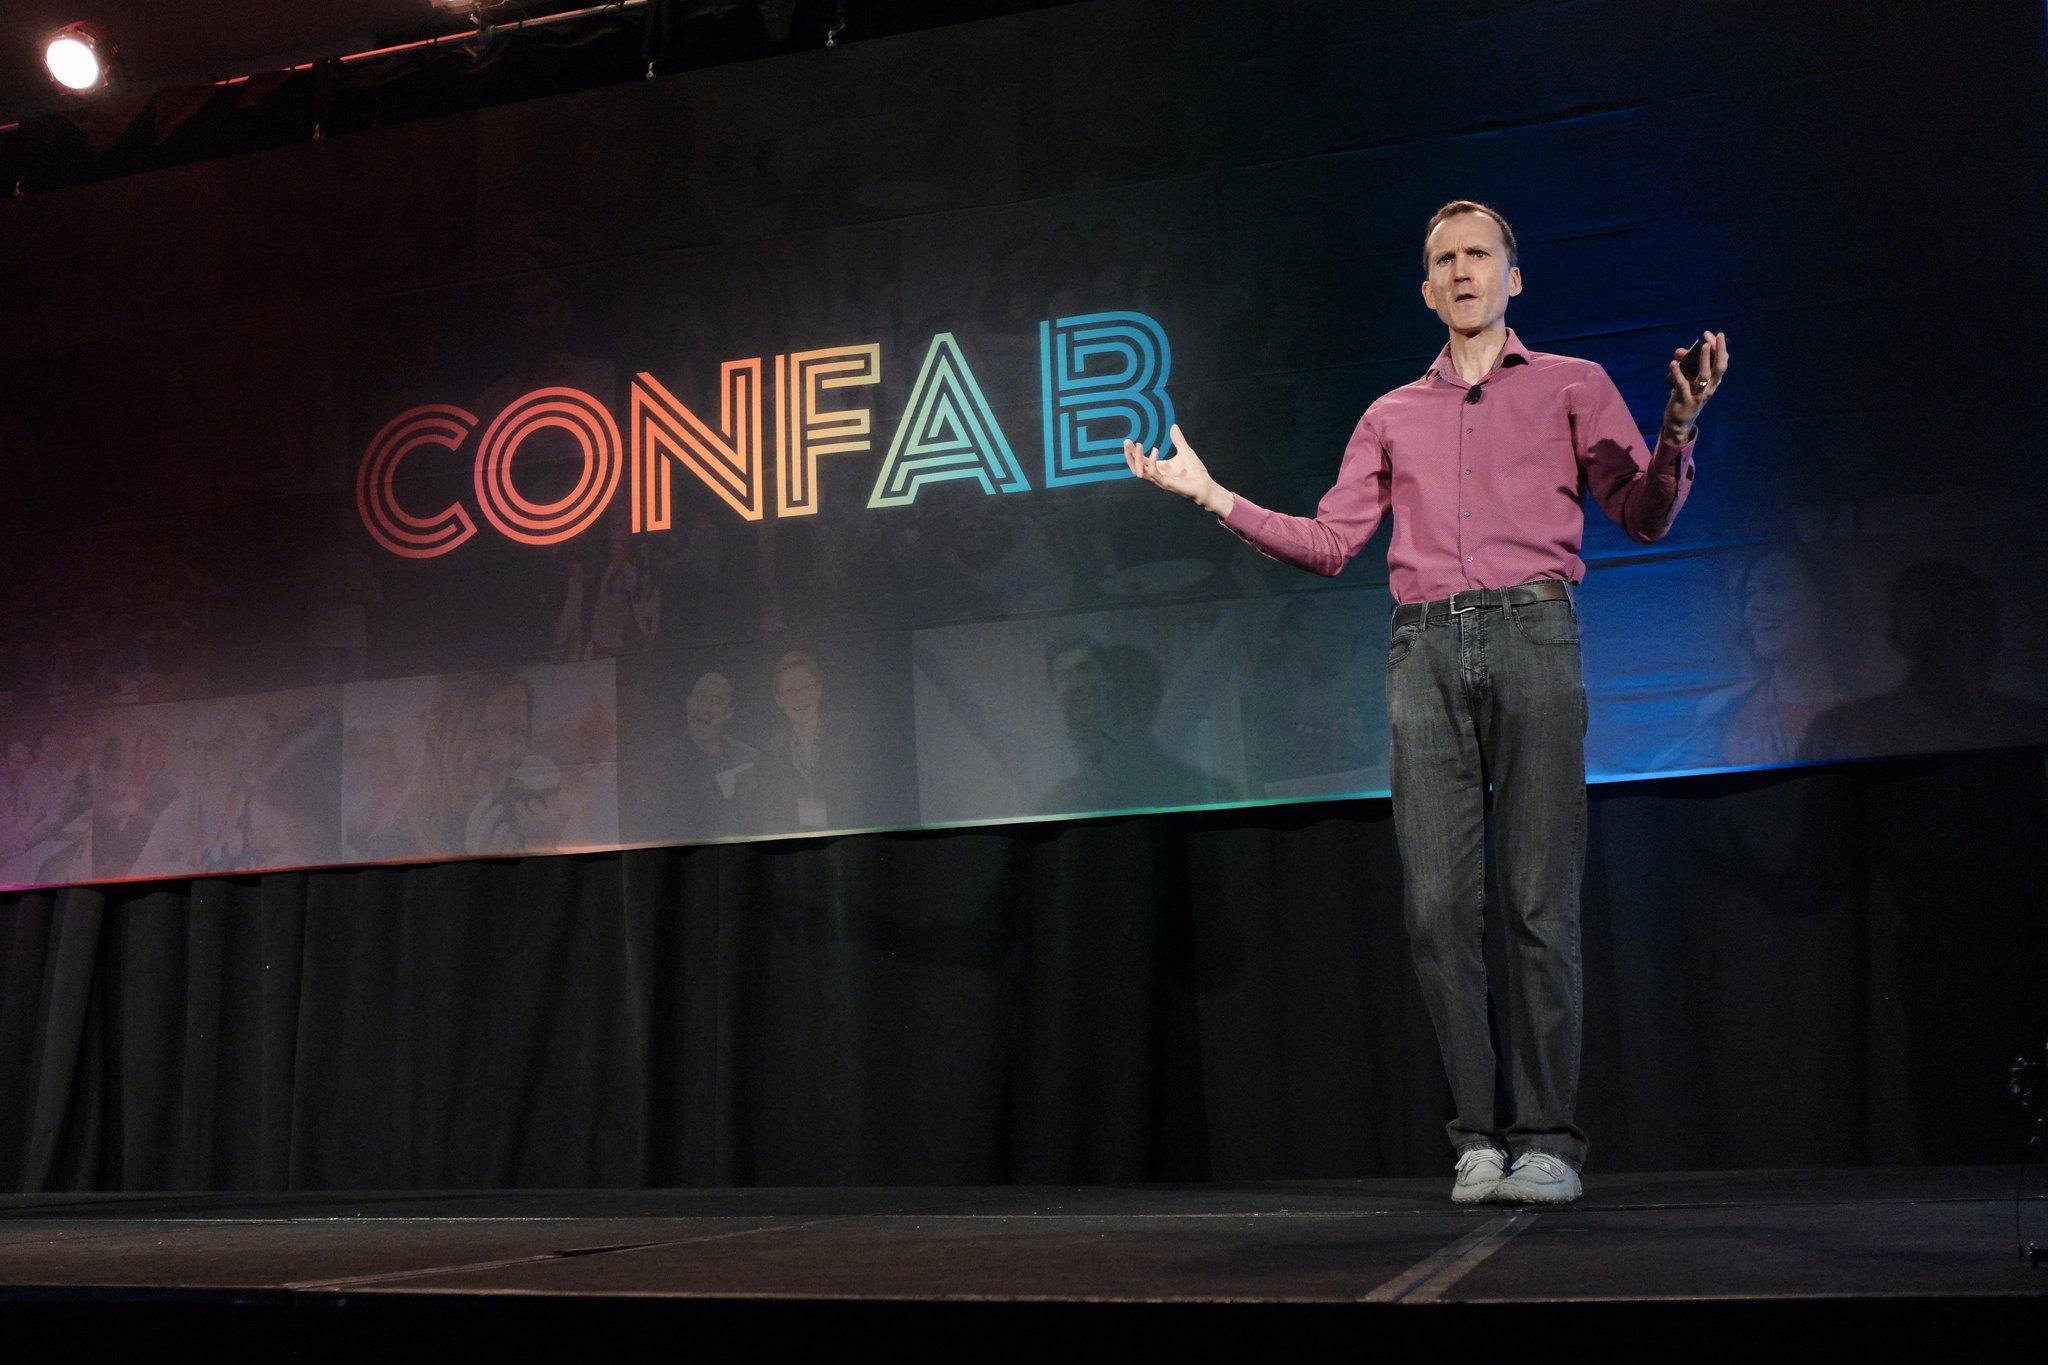 Confab 2018 videos